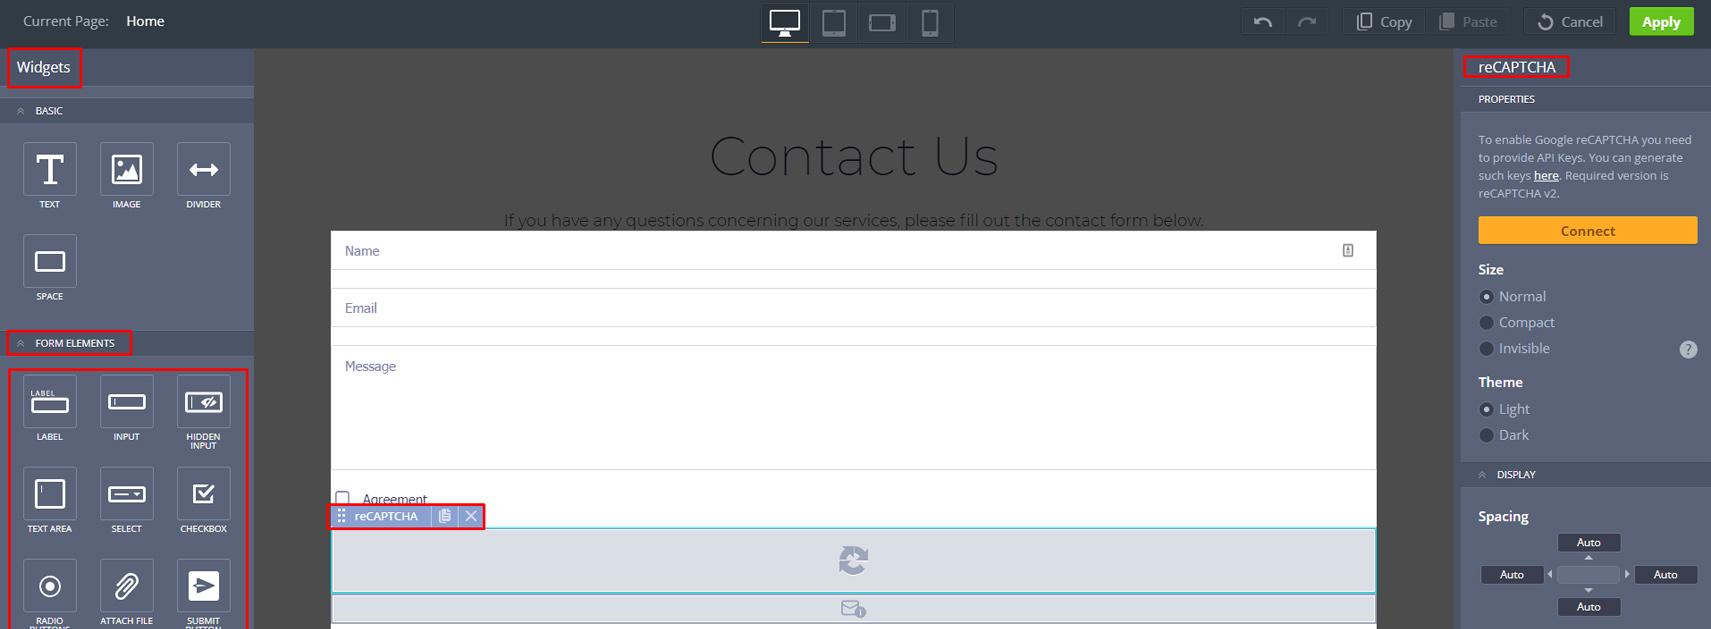 Contact Form Website Builder Plugin